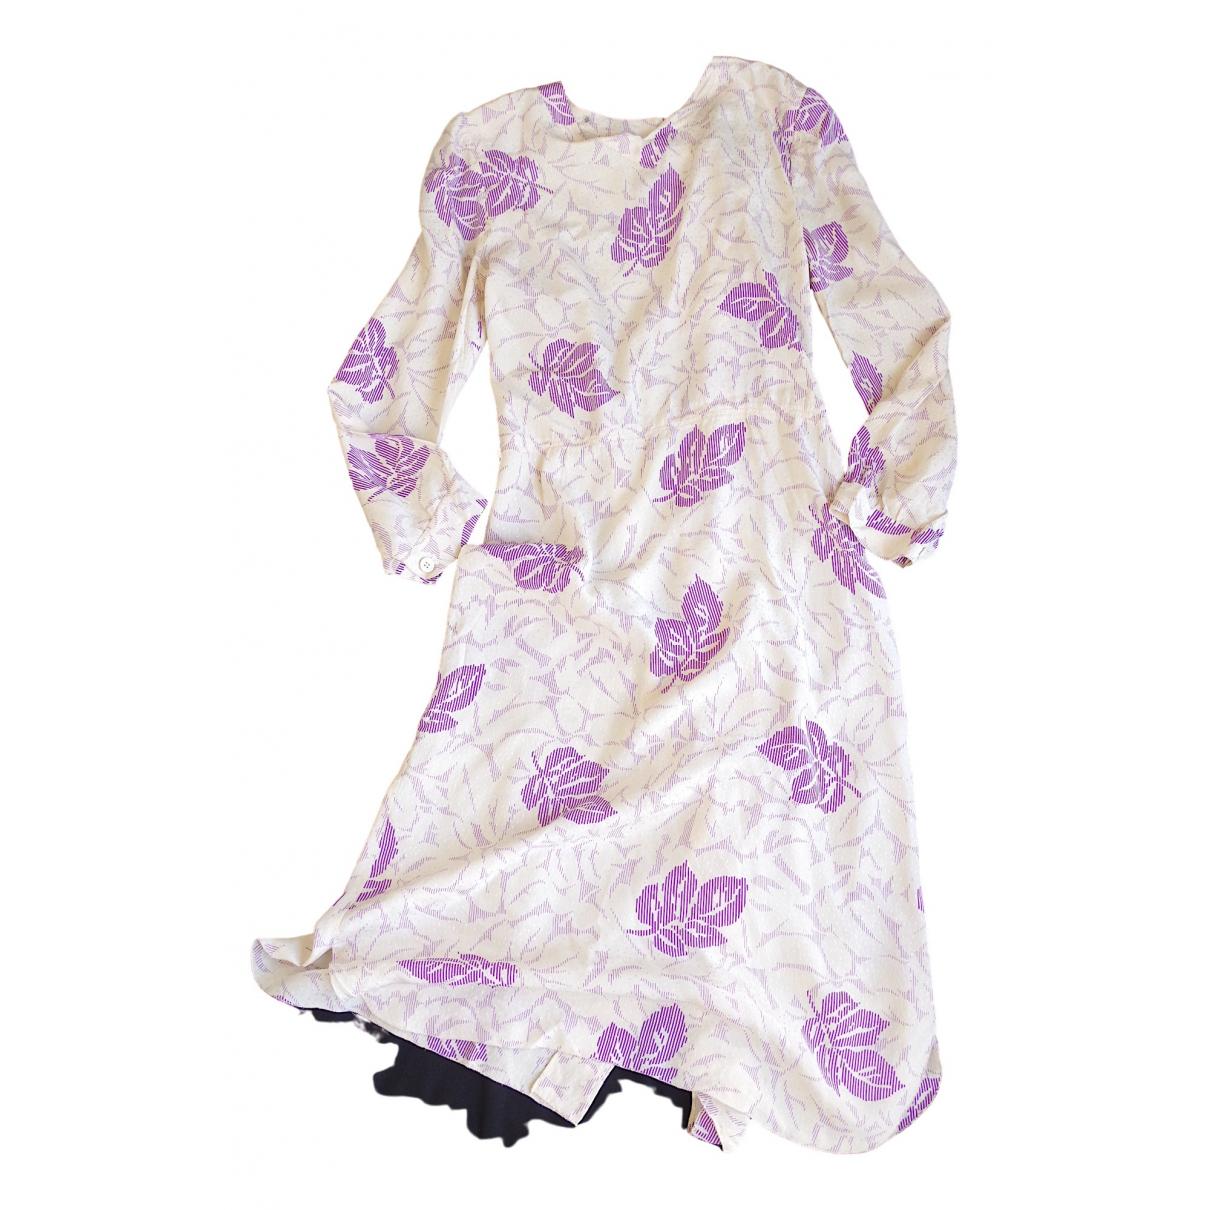 Sonia Rykiel \N Kleid in  Ecru Seide